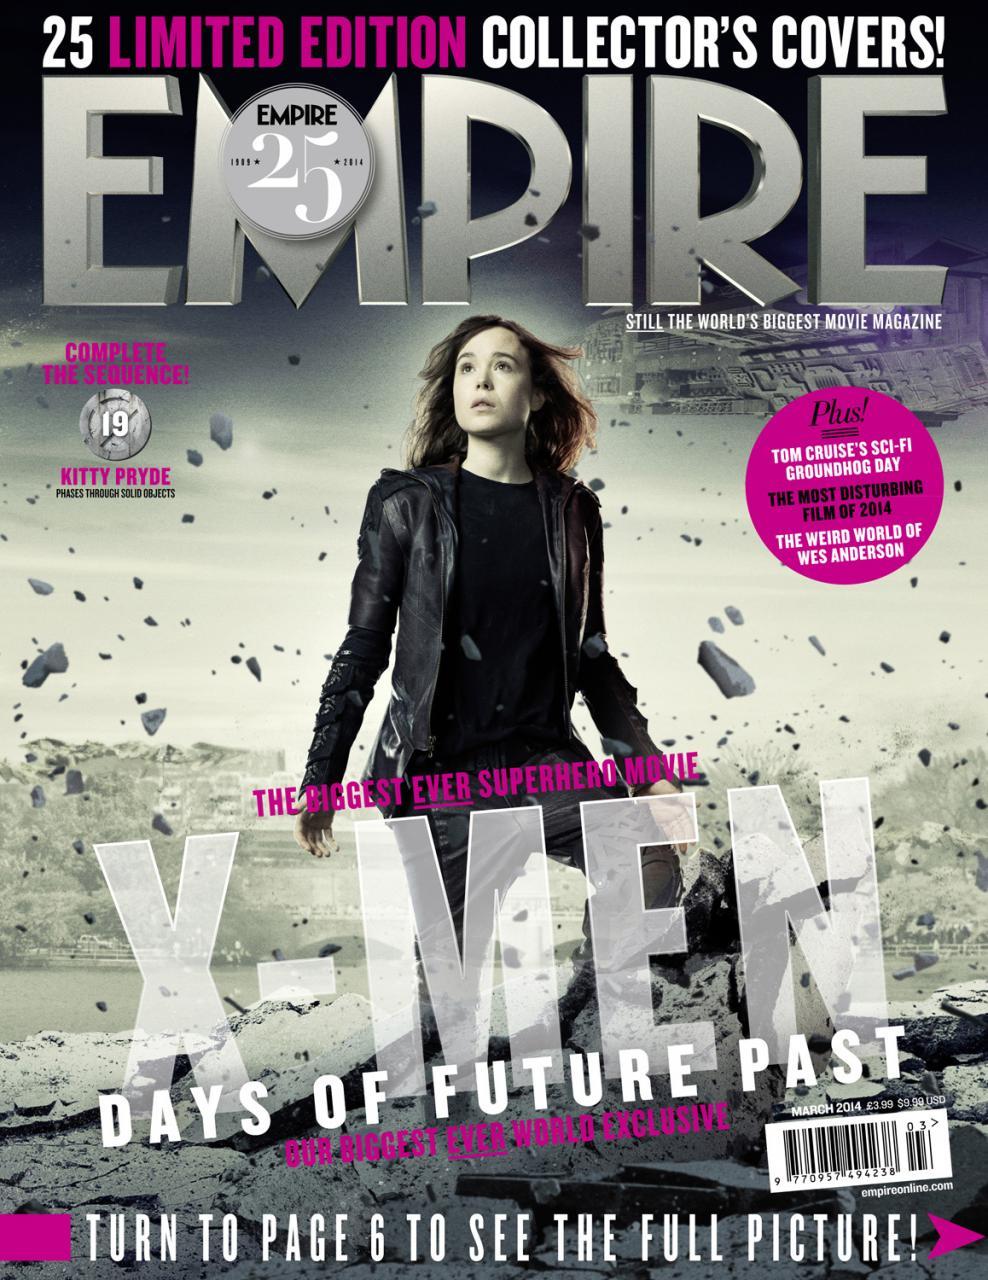 Empire Xmen Days Of Future Past Covers (3)